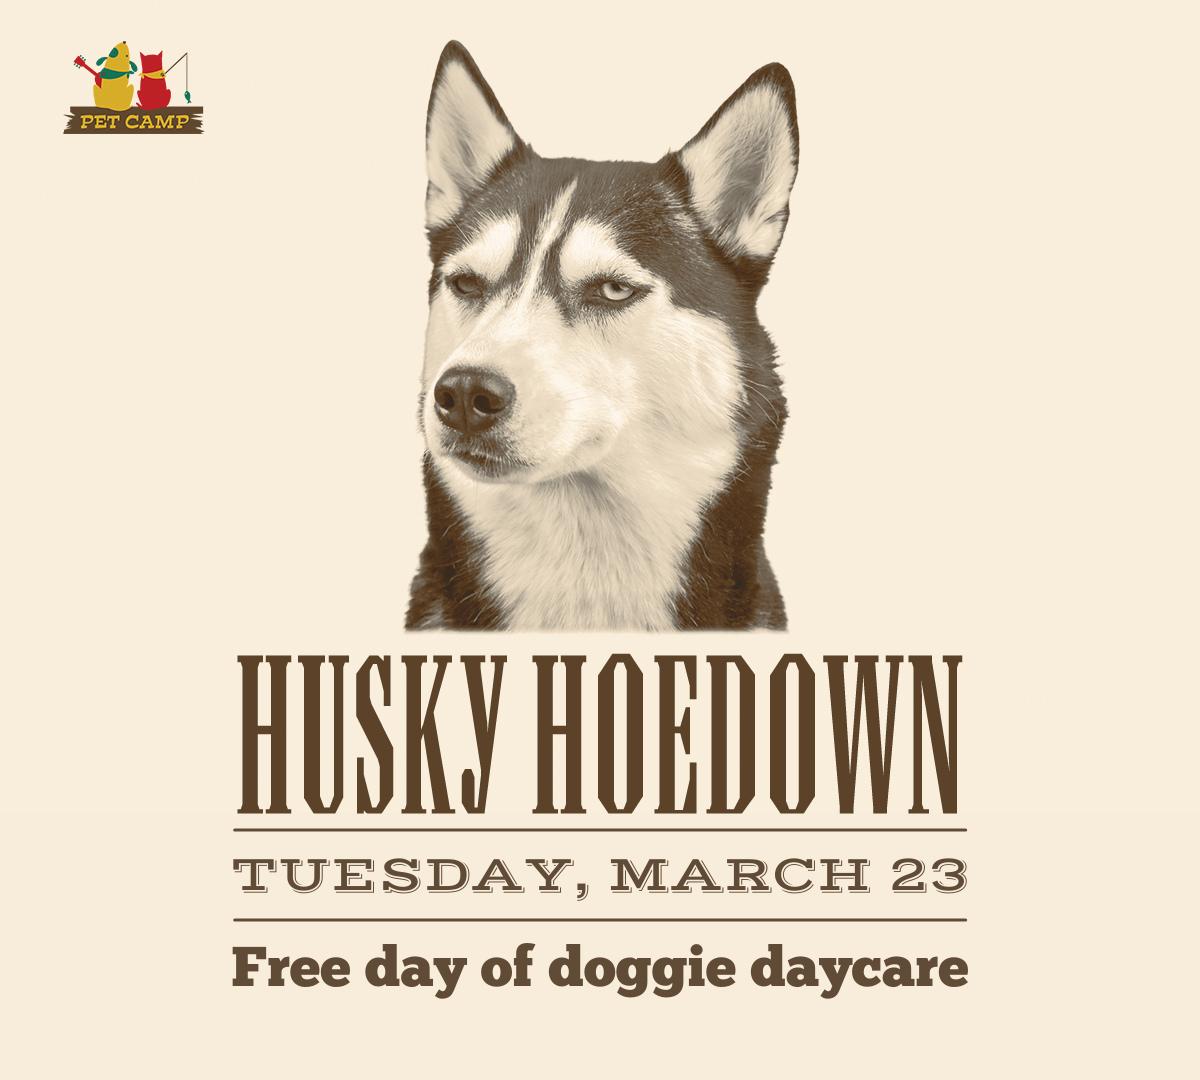 husky hoedown